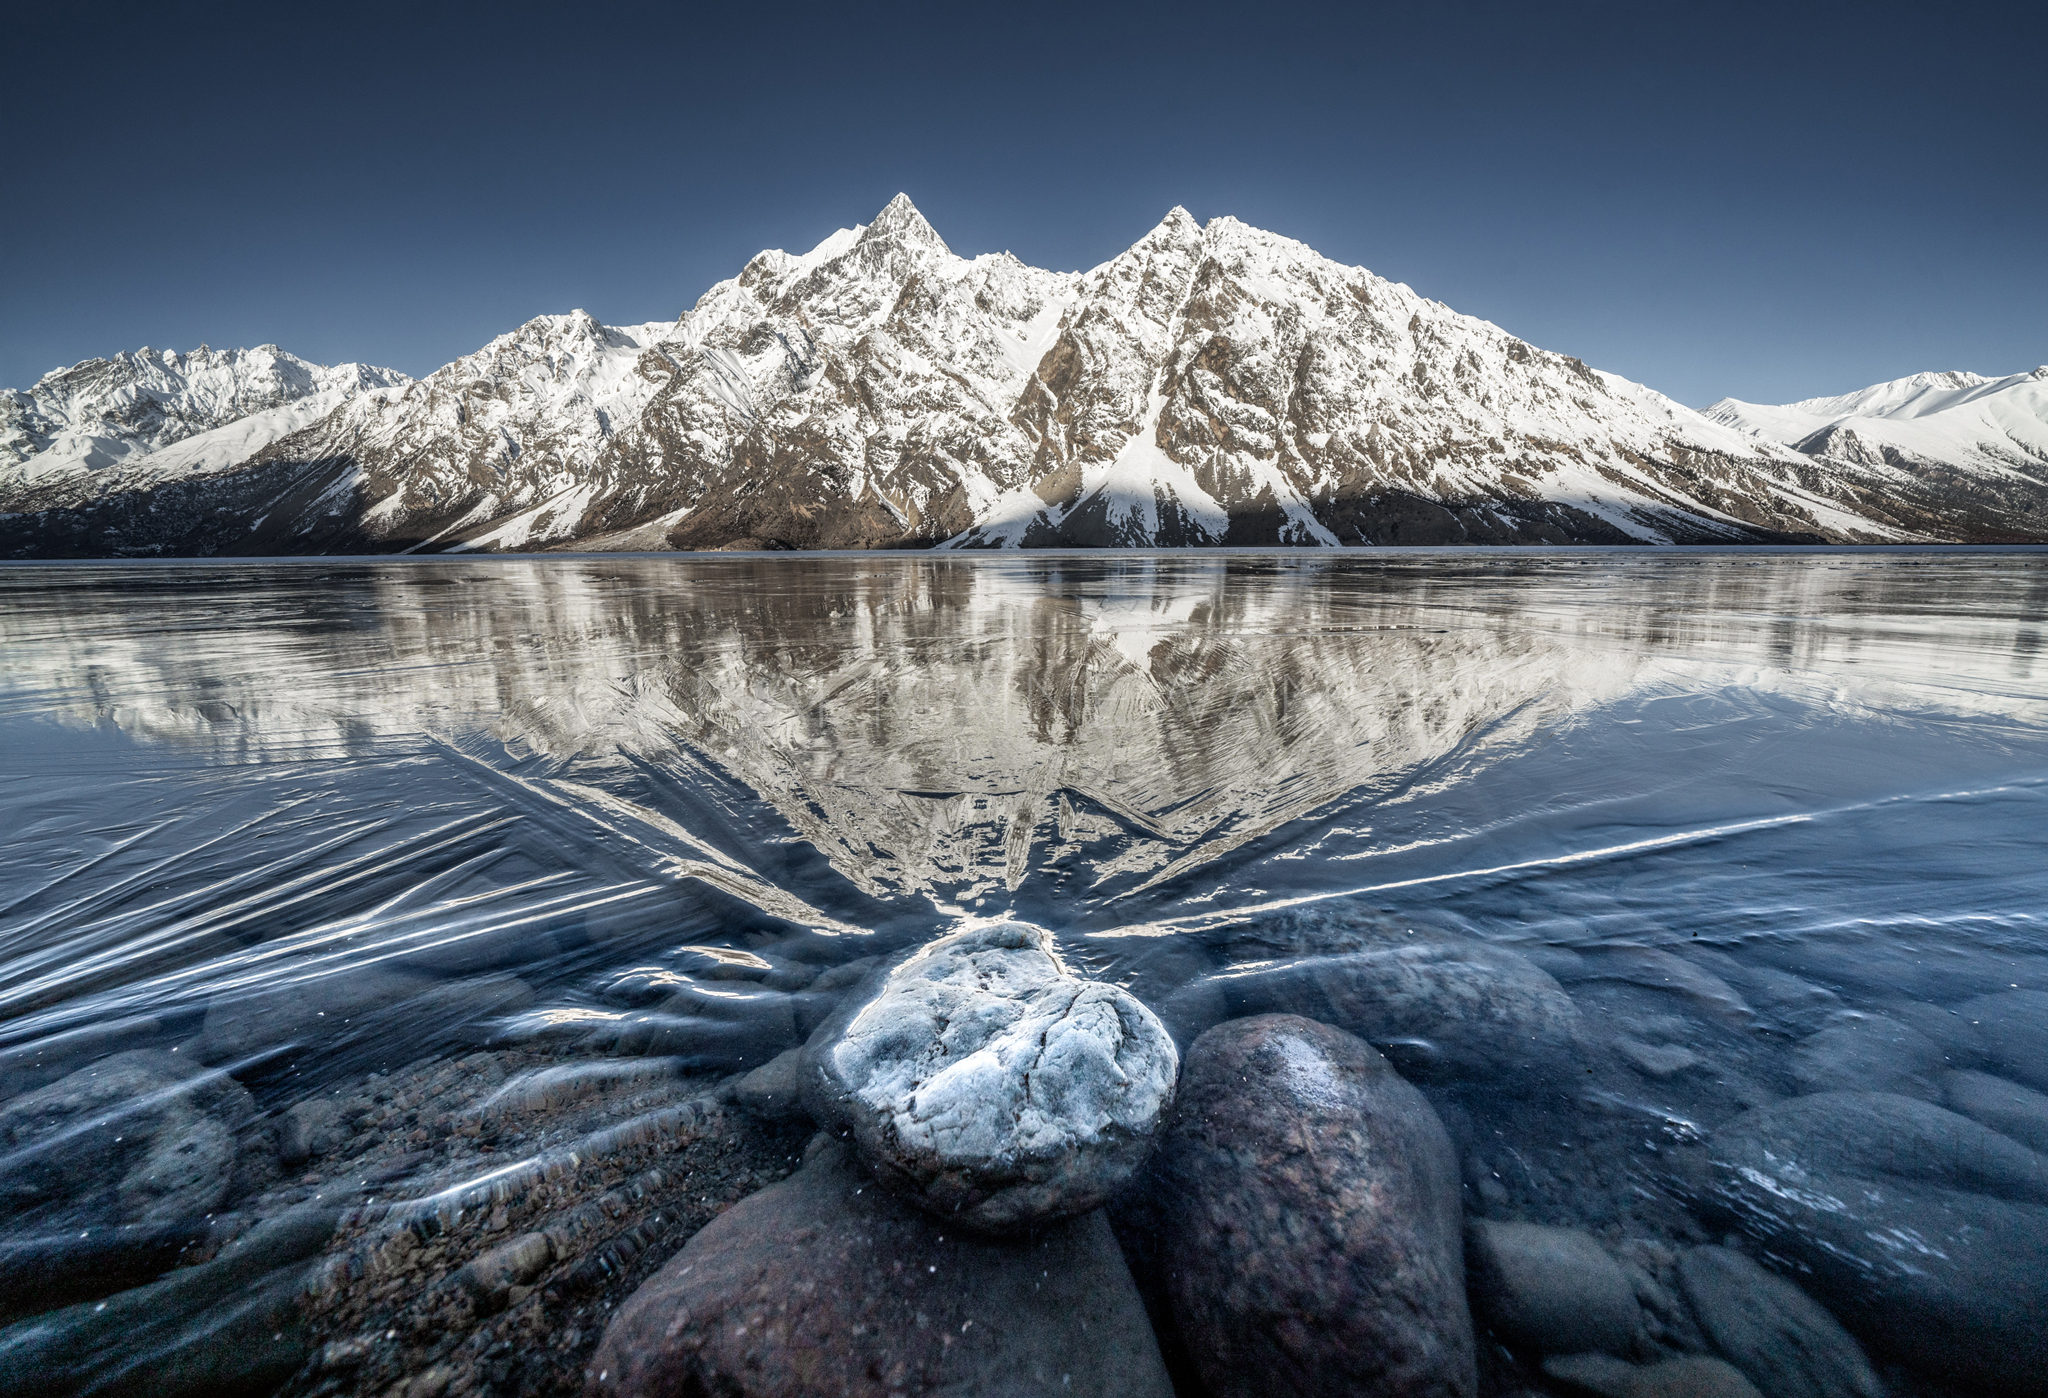 TibetLandscapes-mountnrockrflecn_WM.jpg